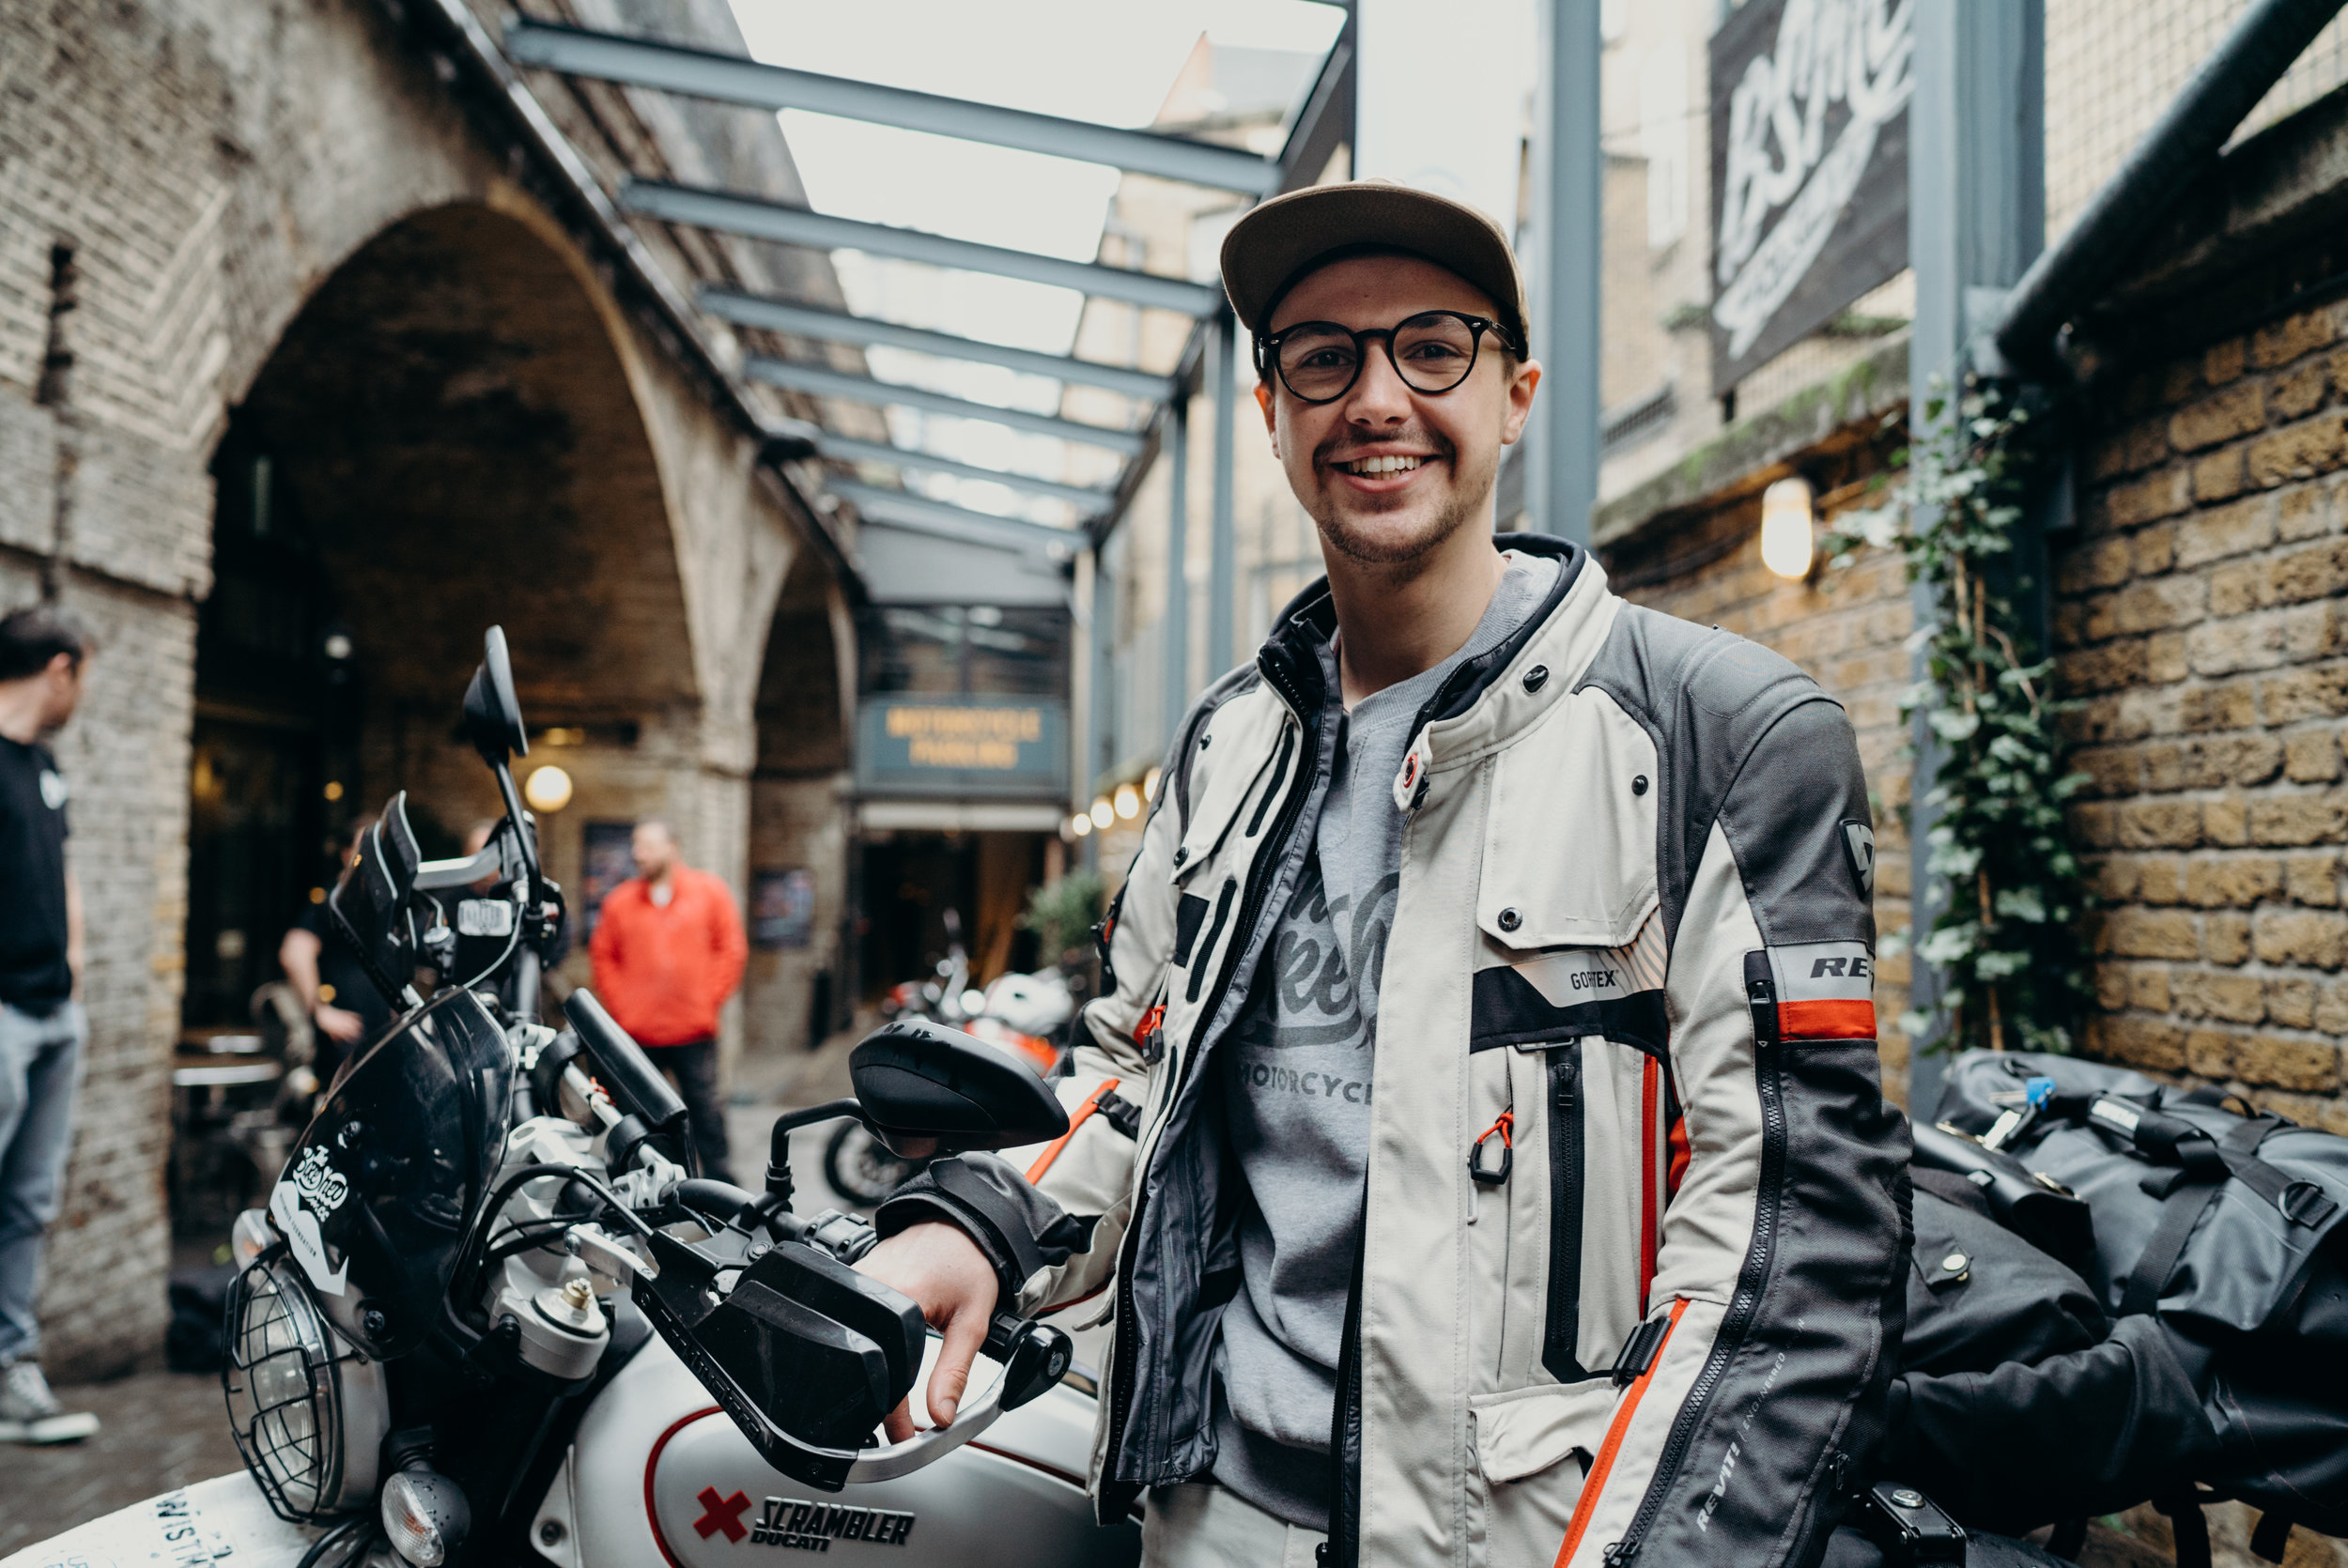 Henry-Crew-35000Miles-Adventure-Rider-Radio-Motorcycle-Podcast-1.jpg